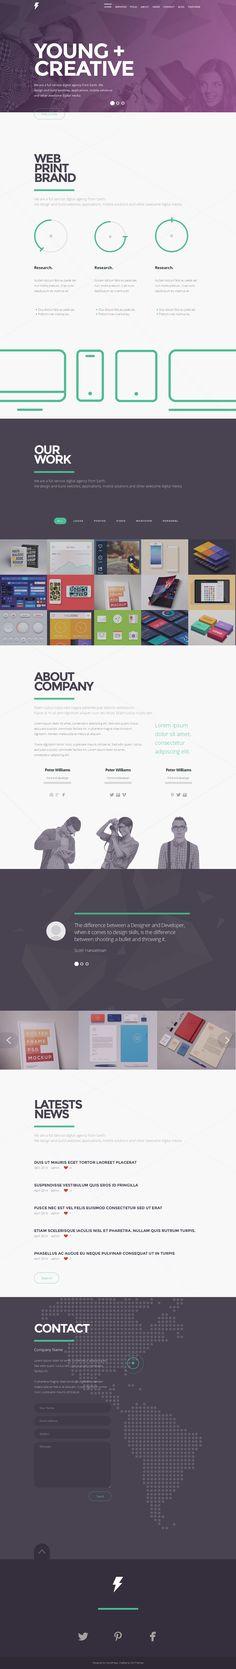 SENSA is simple and clean one page portfolio WordPress theme. on - Wordpress Portfolio Theme - Ideas of Wordpress Portfolio Theme - SENSA is simple and clean one page portfolio WordPress theme. Web Responsive, Ui Web, Wireframe, Digital Communication, Desktop Design, Creative Web Design, Website Design, Layout, Web Design Inspiration